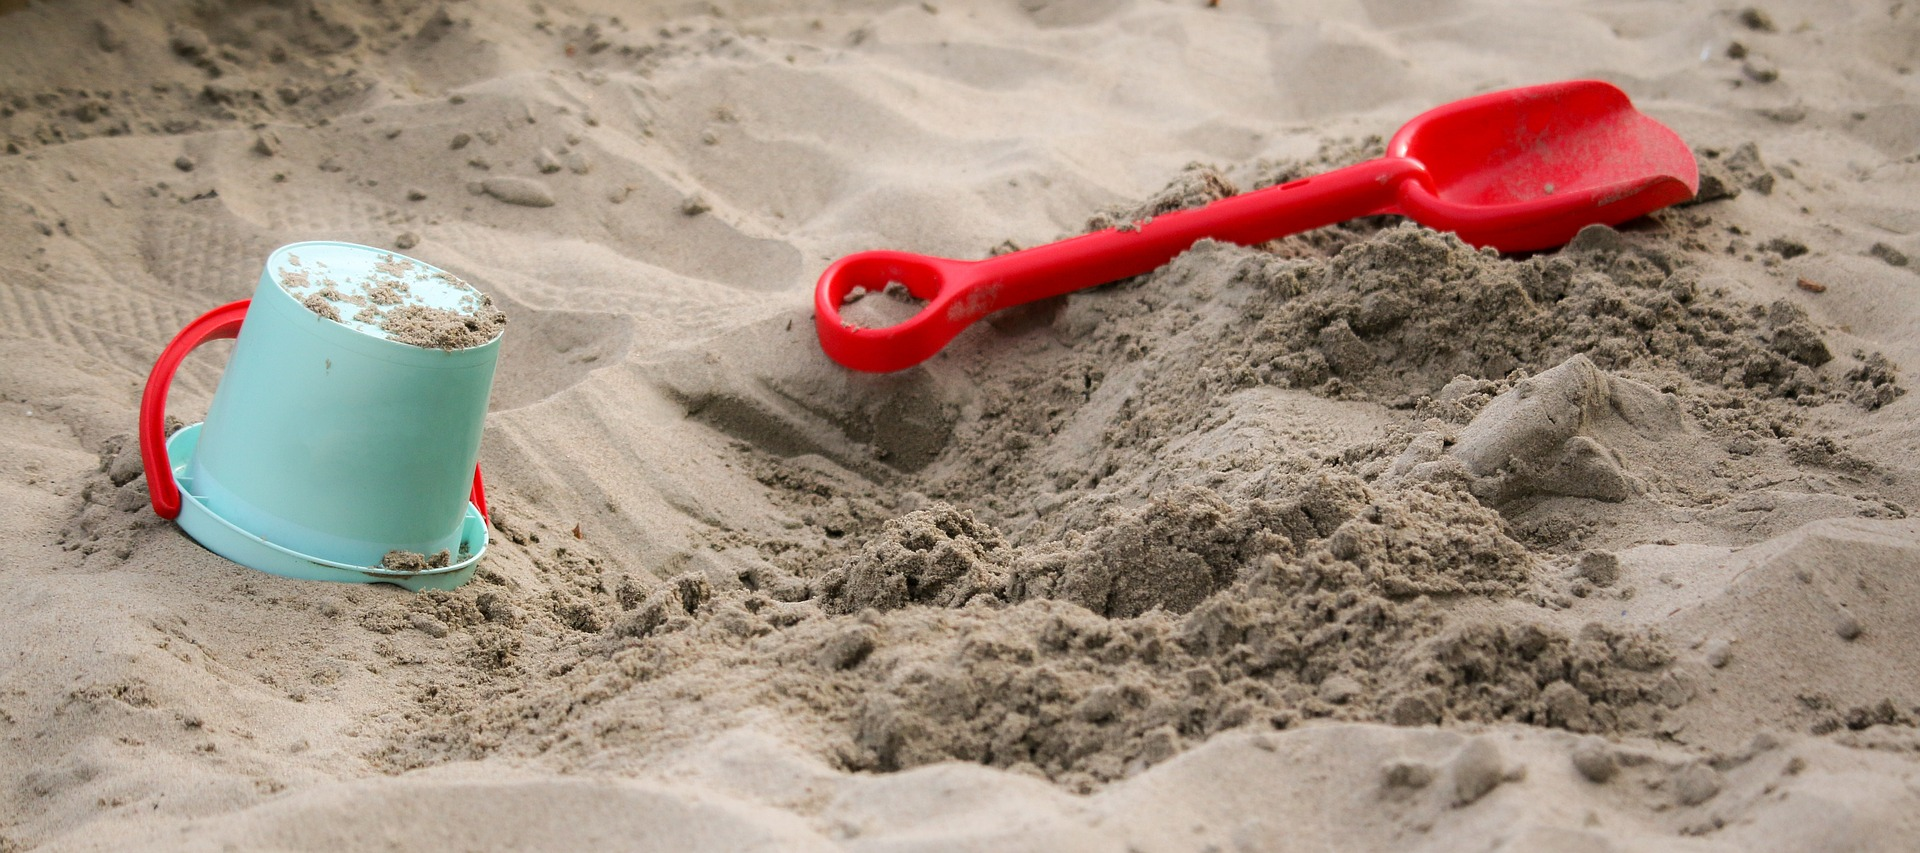 sandbox-1583289_1920 copy